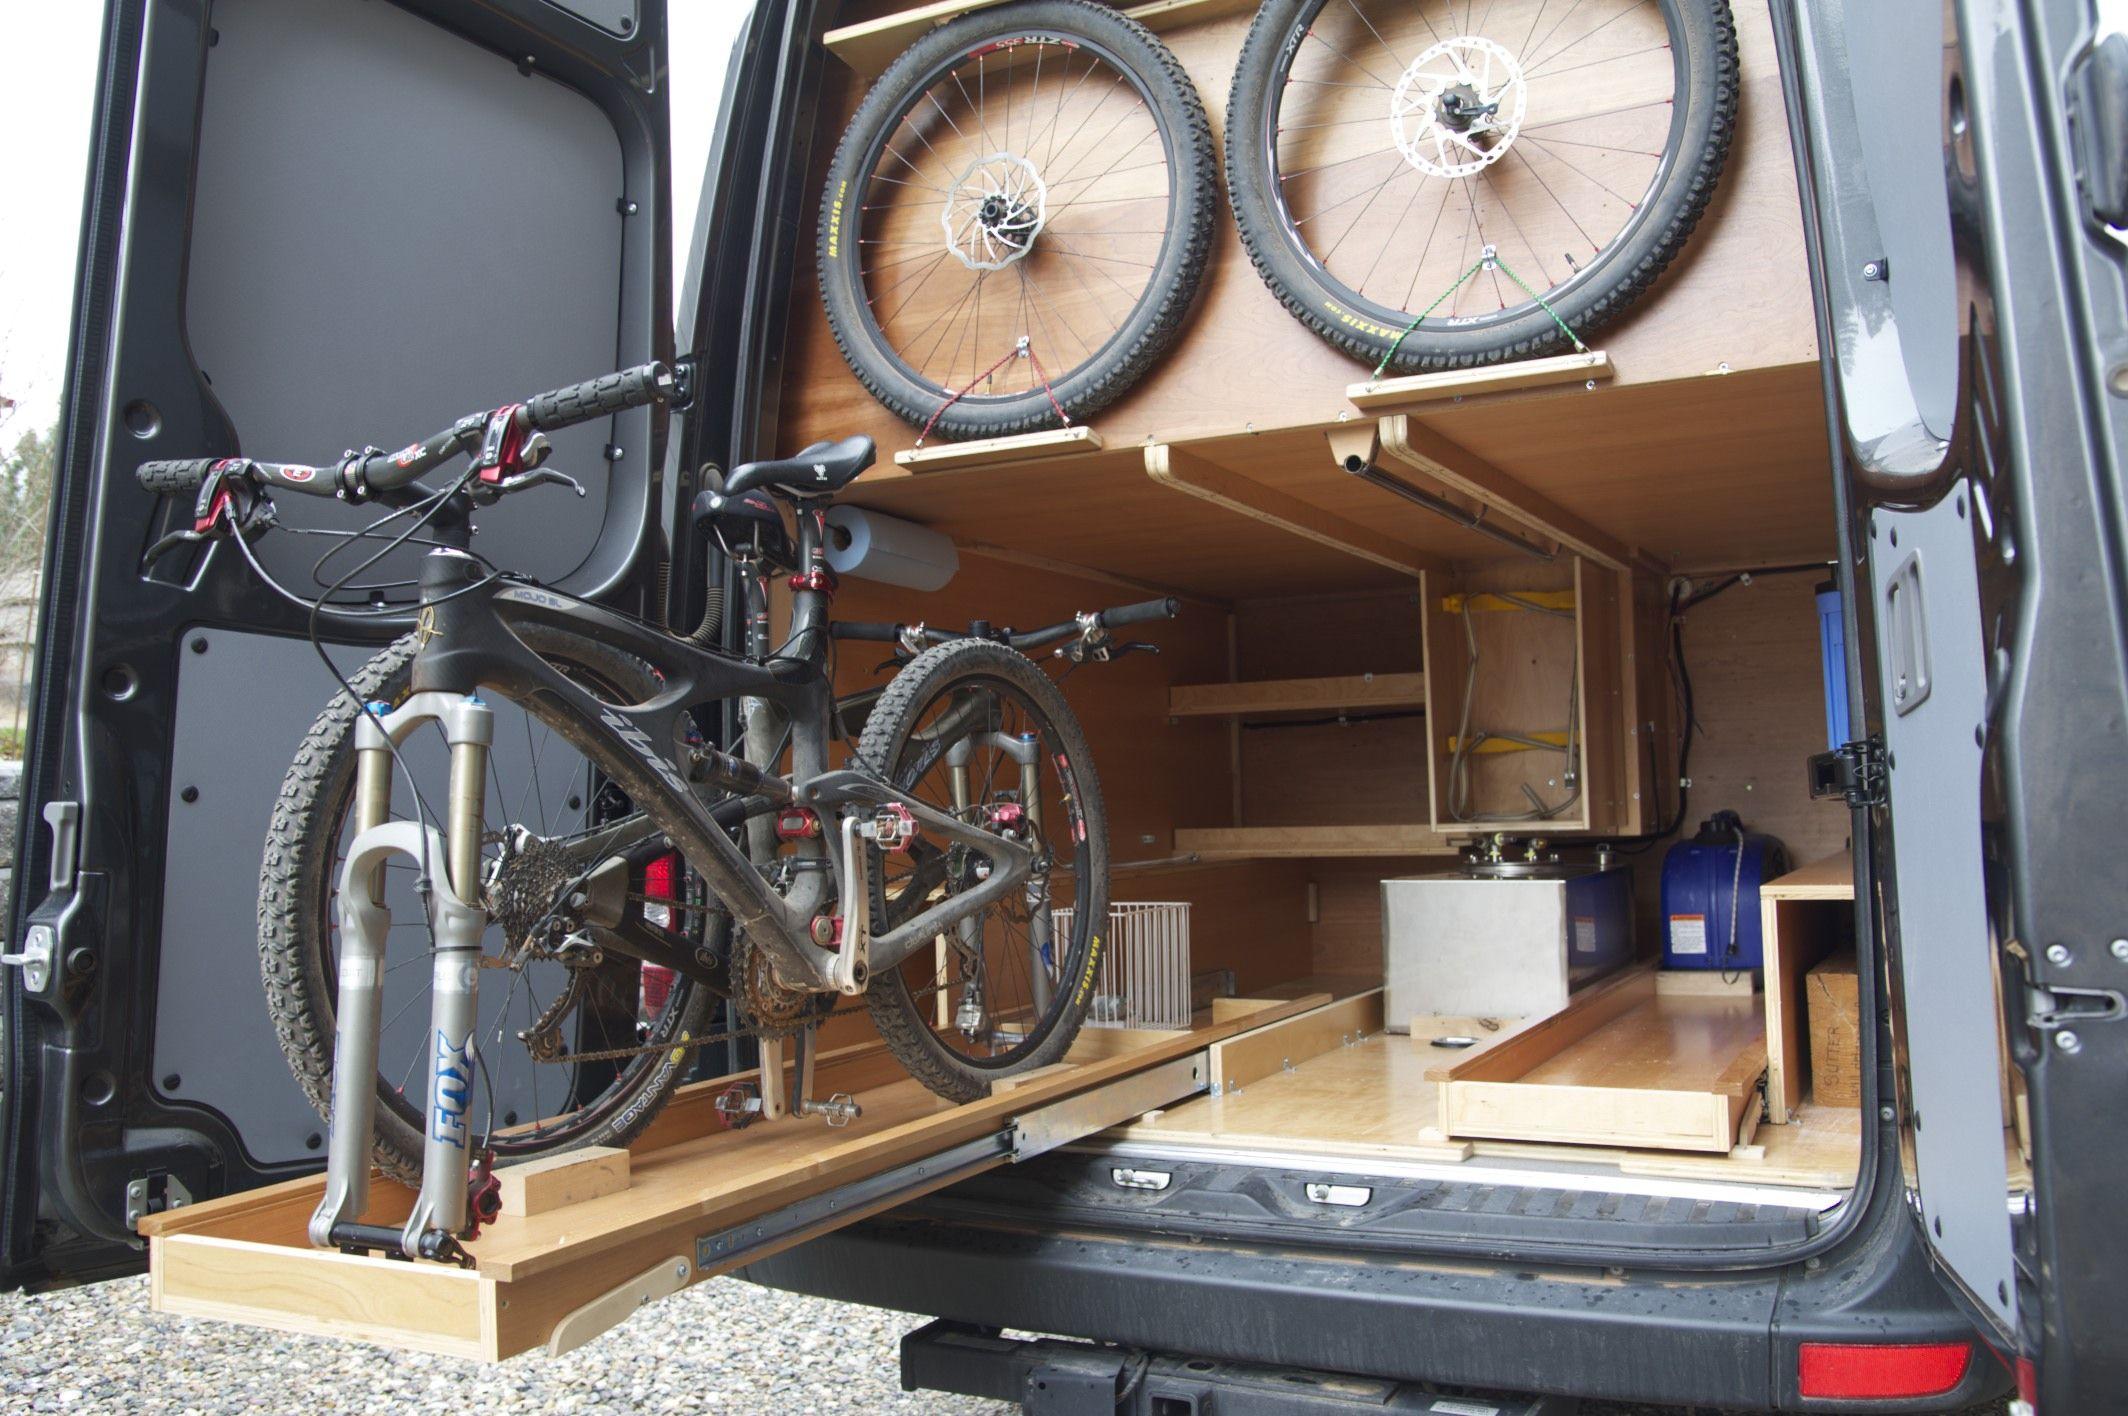 20 Of The Best Camper Vans With Bike Storage Vans